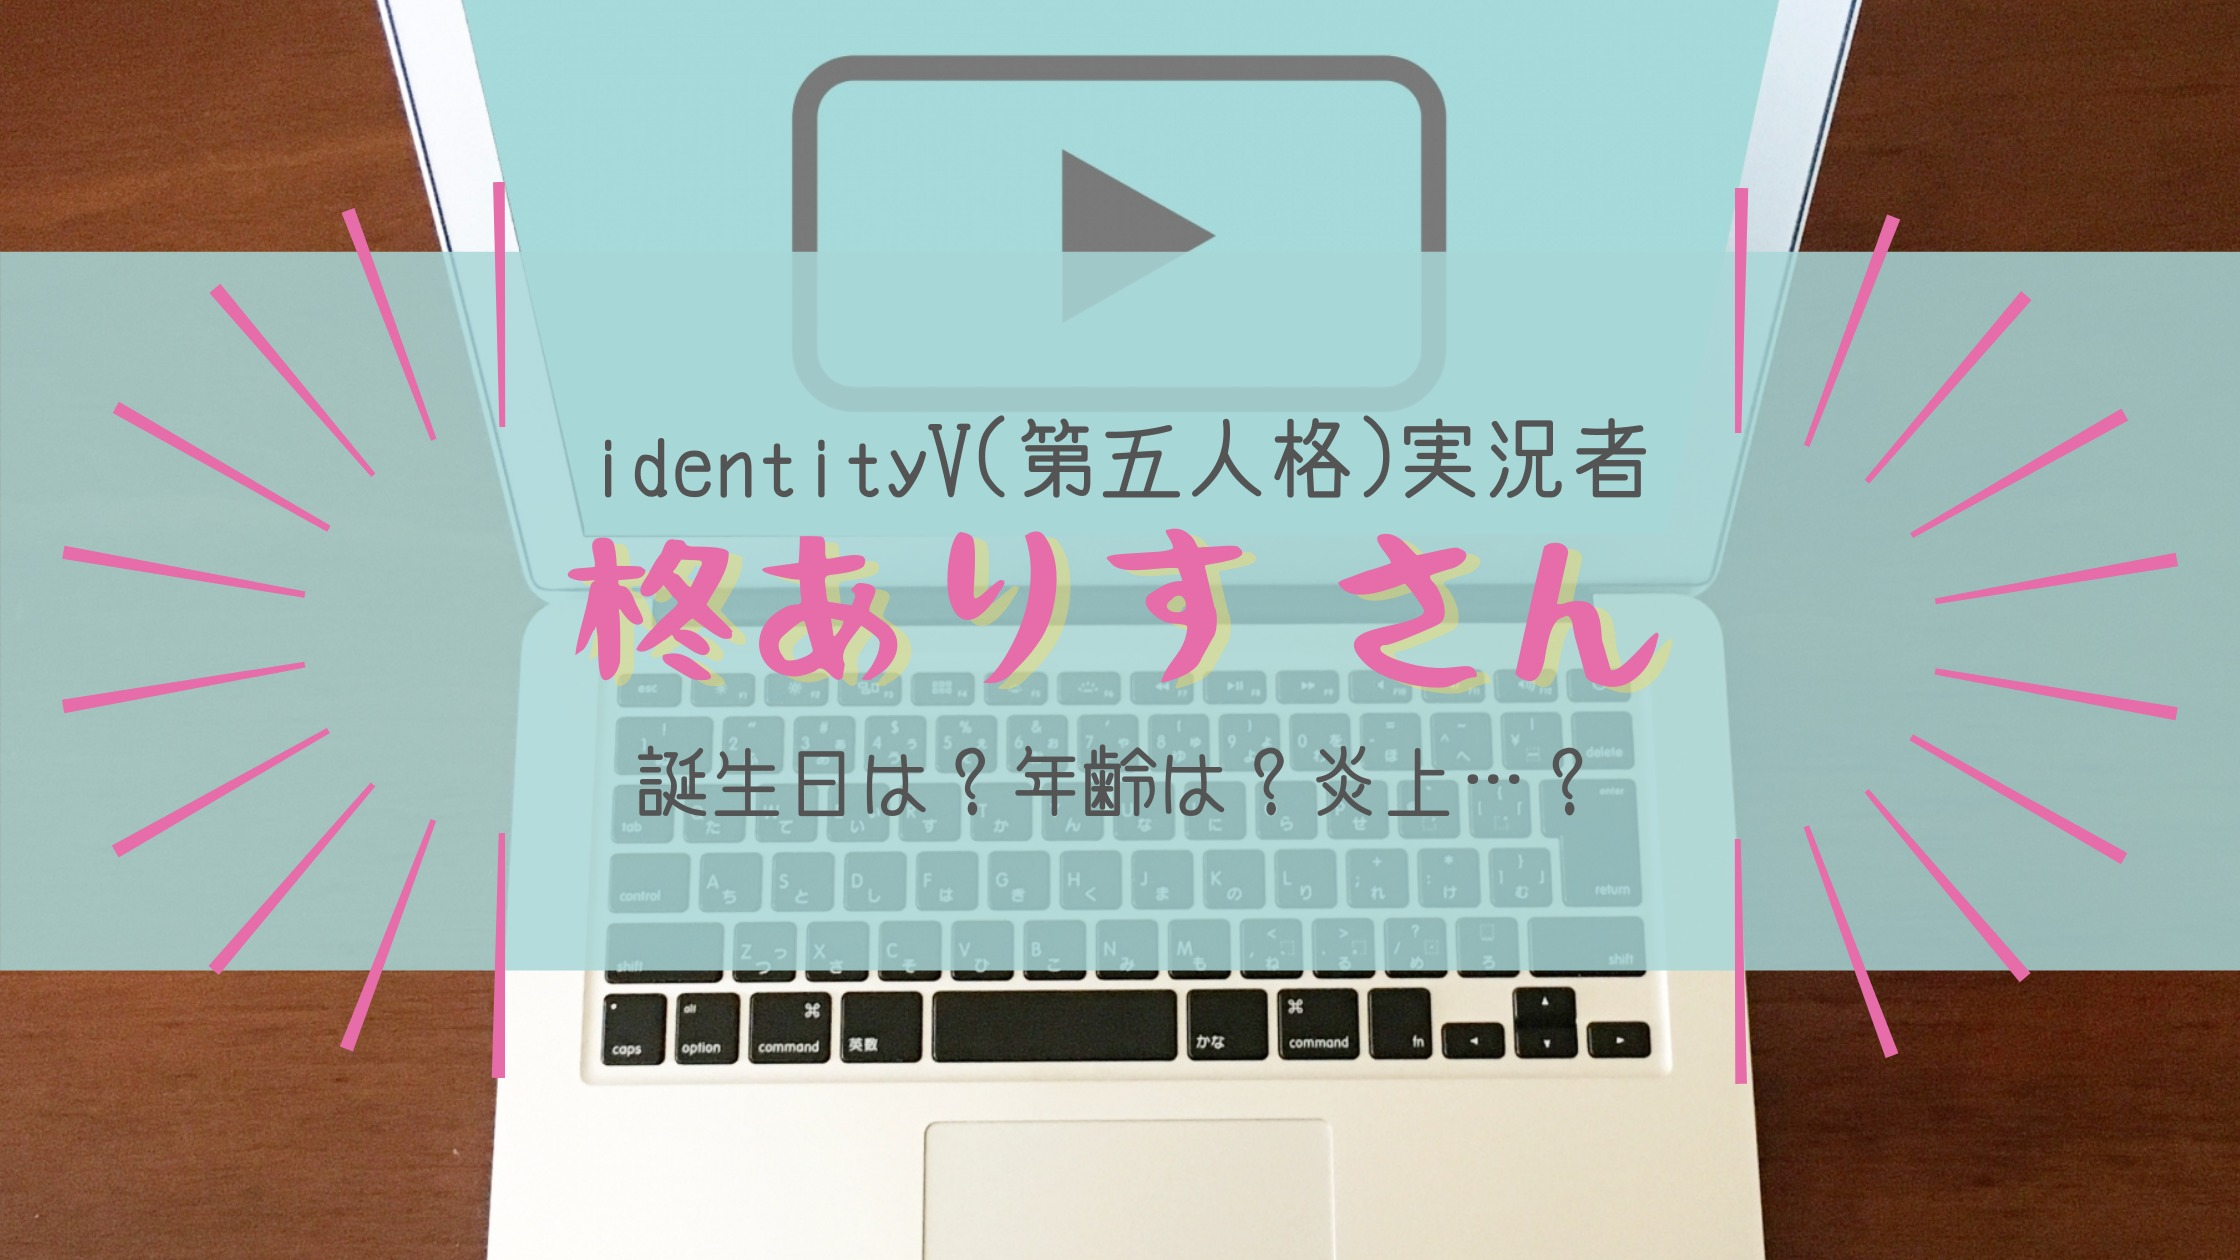 identityV(第五人格)実況者 柊ありすさん